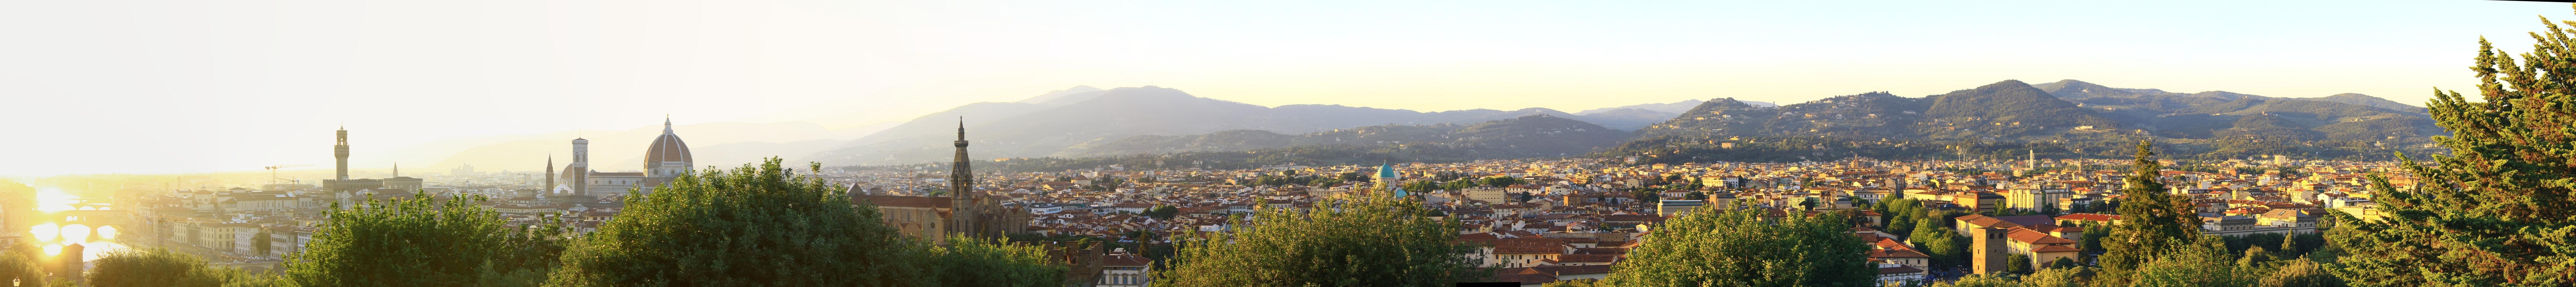 Panoramic Shot Of City, Architecture, Panorama, Travel, Town, HQ Photo